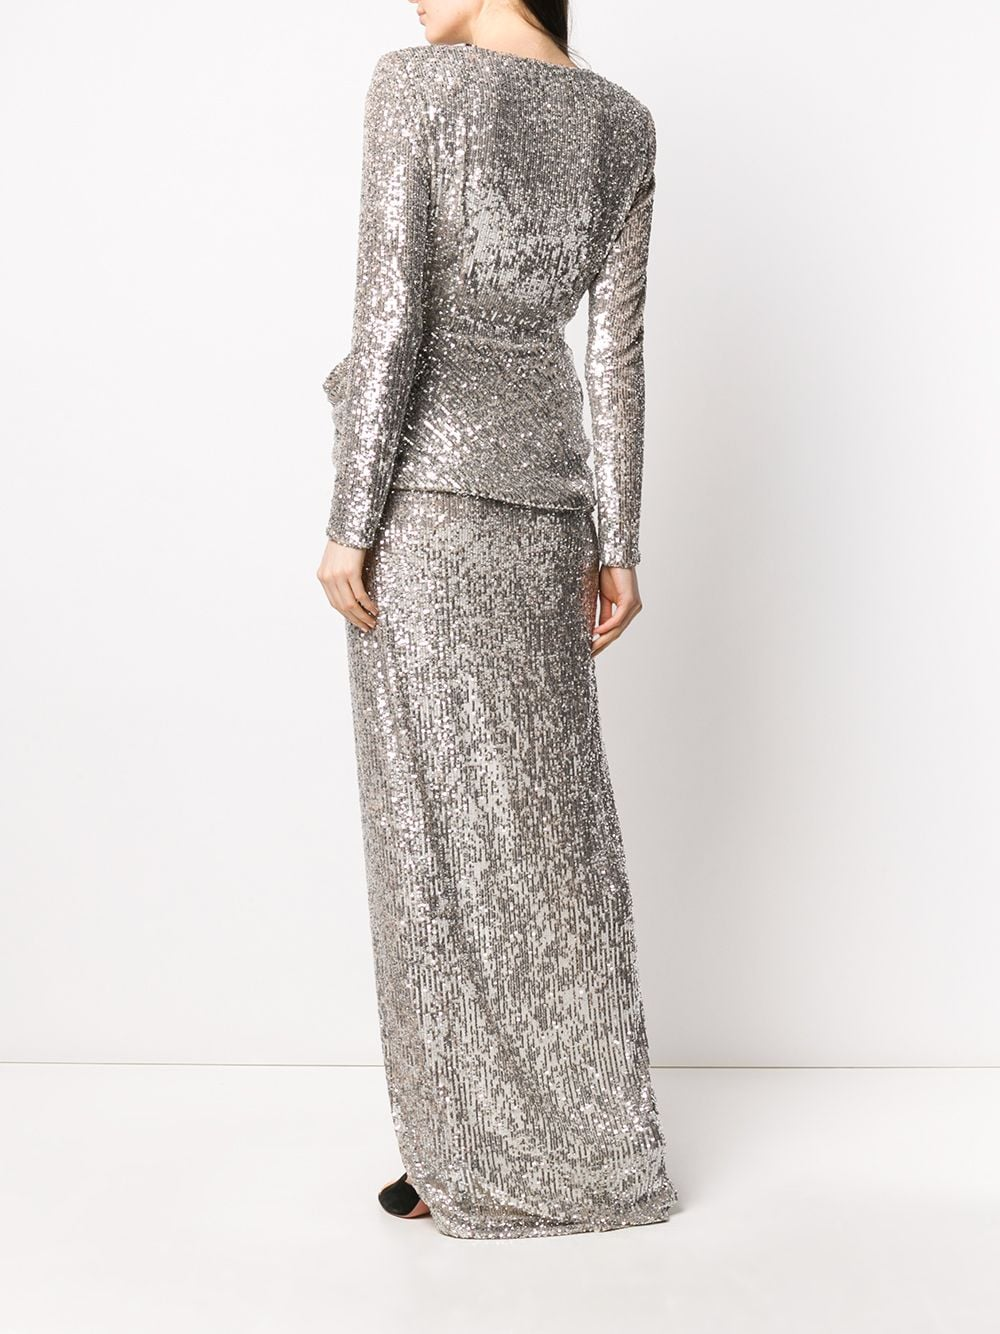 Picture of Nervi | Sequin-Embellished Draped Cocktail Dress